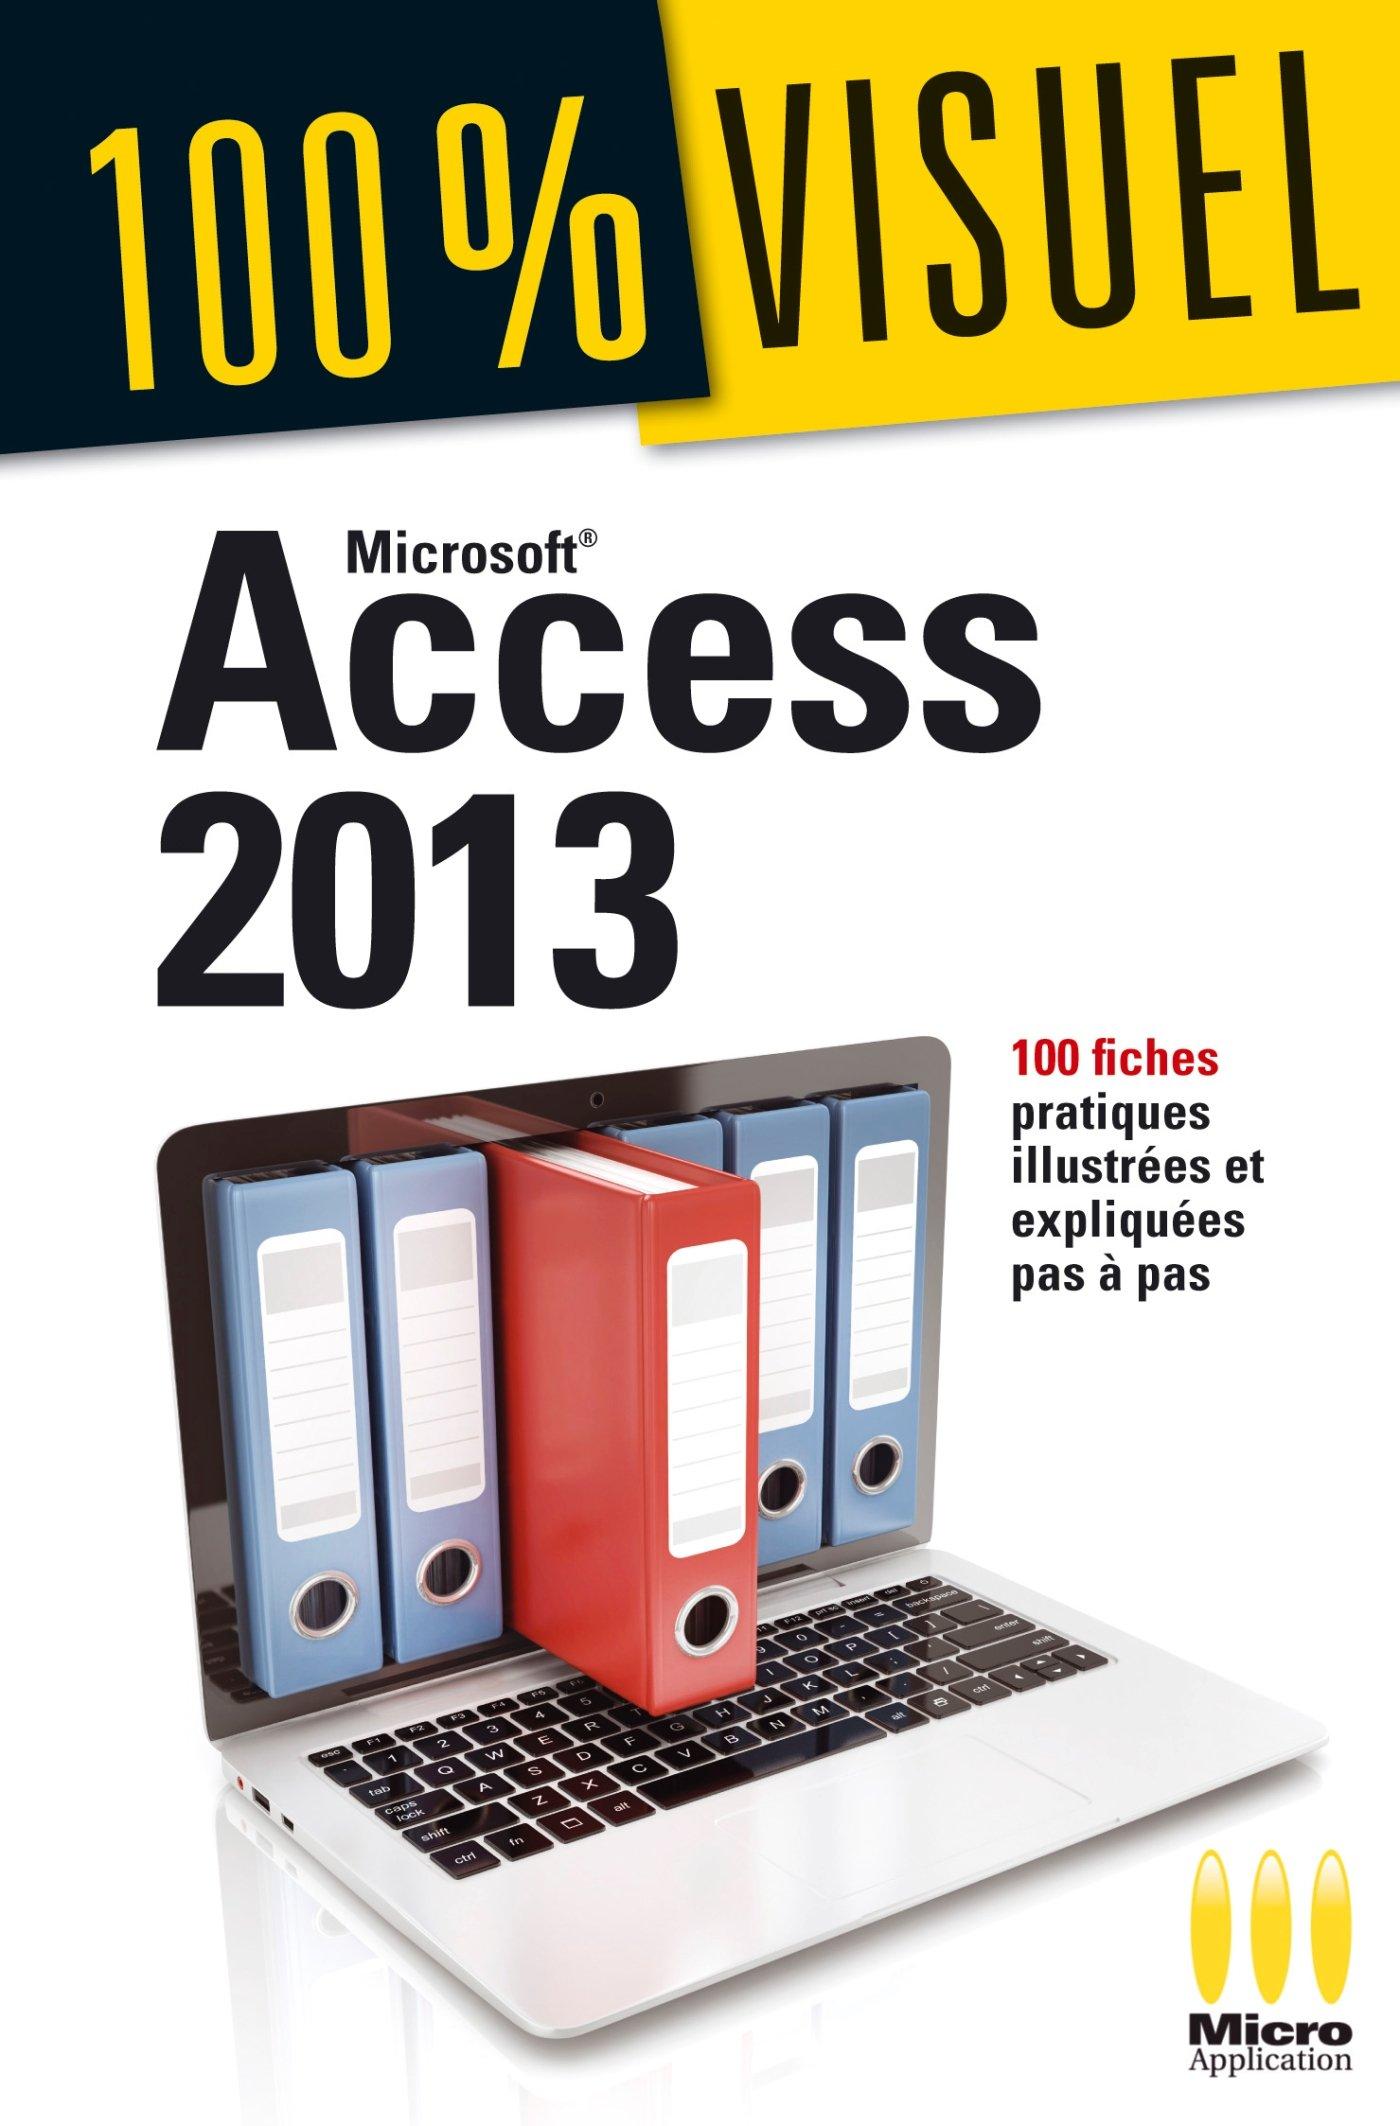 Access 2013 Broché – 16 avril 2014 Elisabeth Ravey MA Editions 2822402493 Informatique